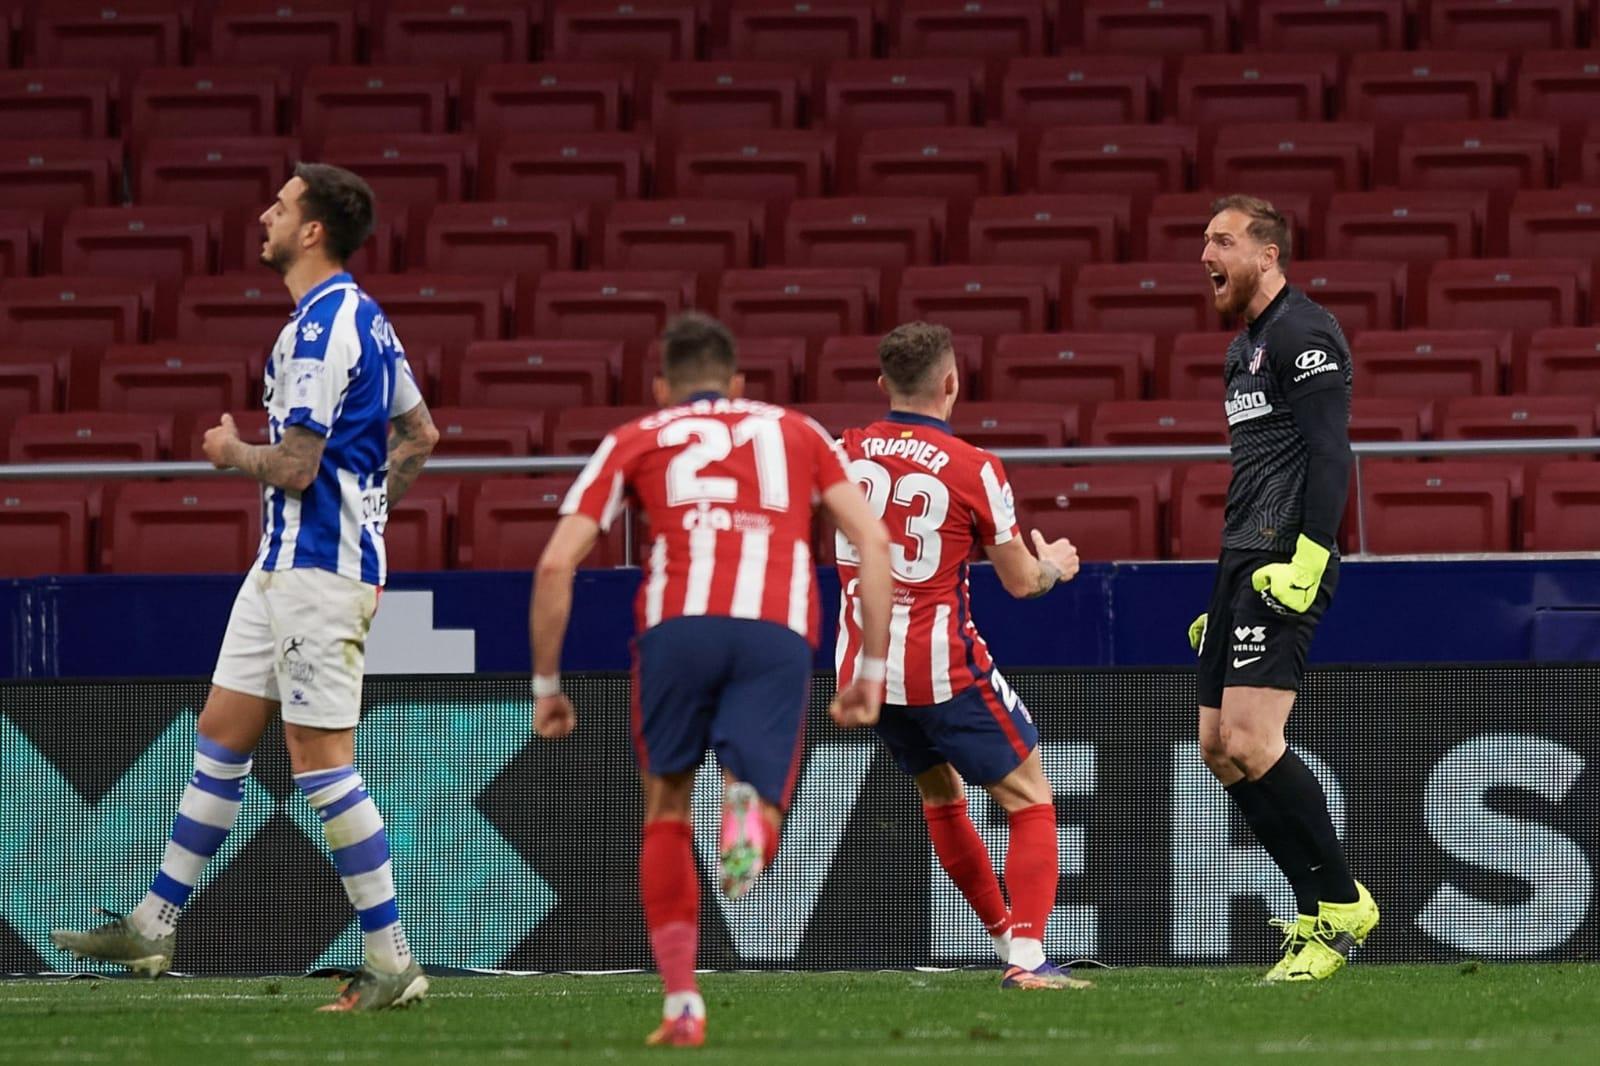 Liga - 28ème j. | Les notes de Atlético de Madrid - Alavès (1-0) 1